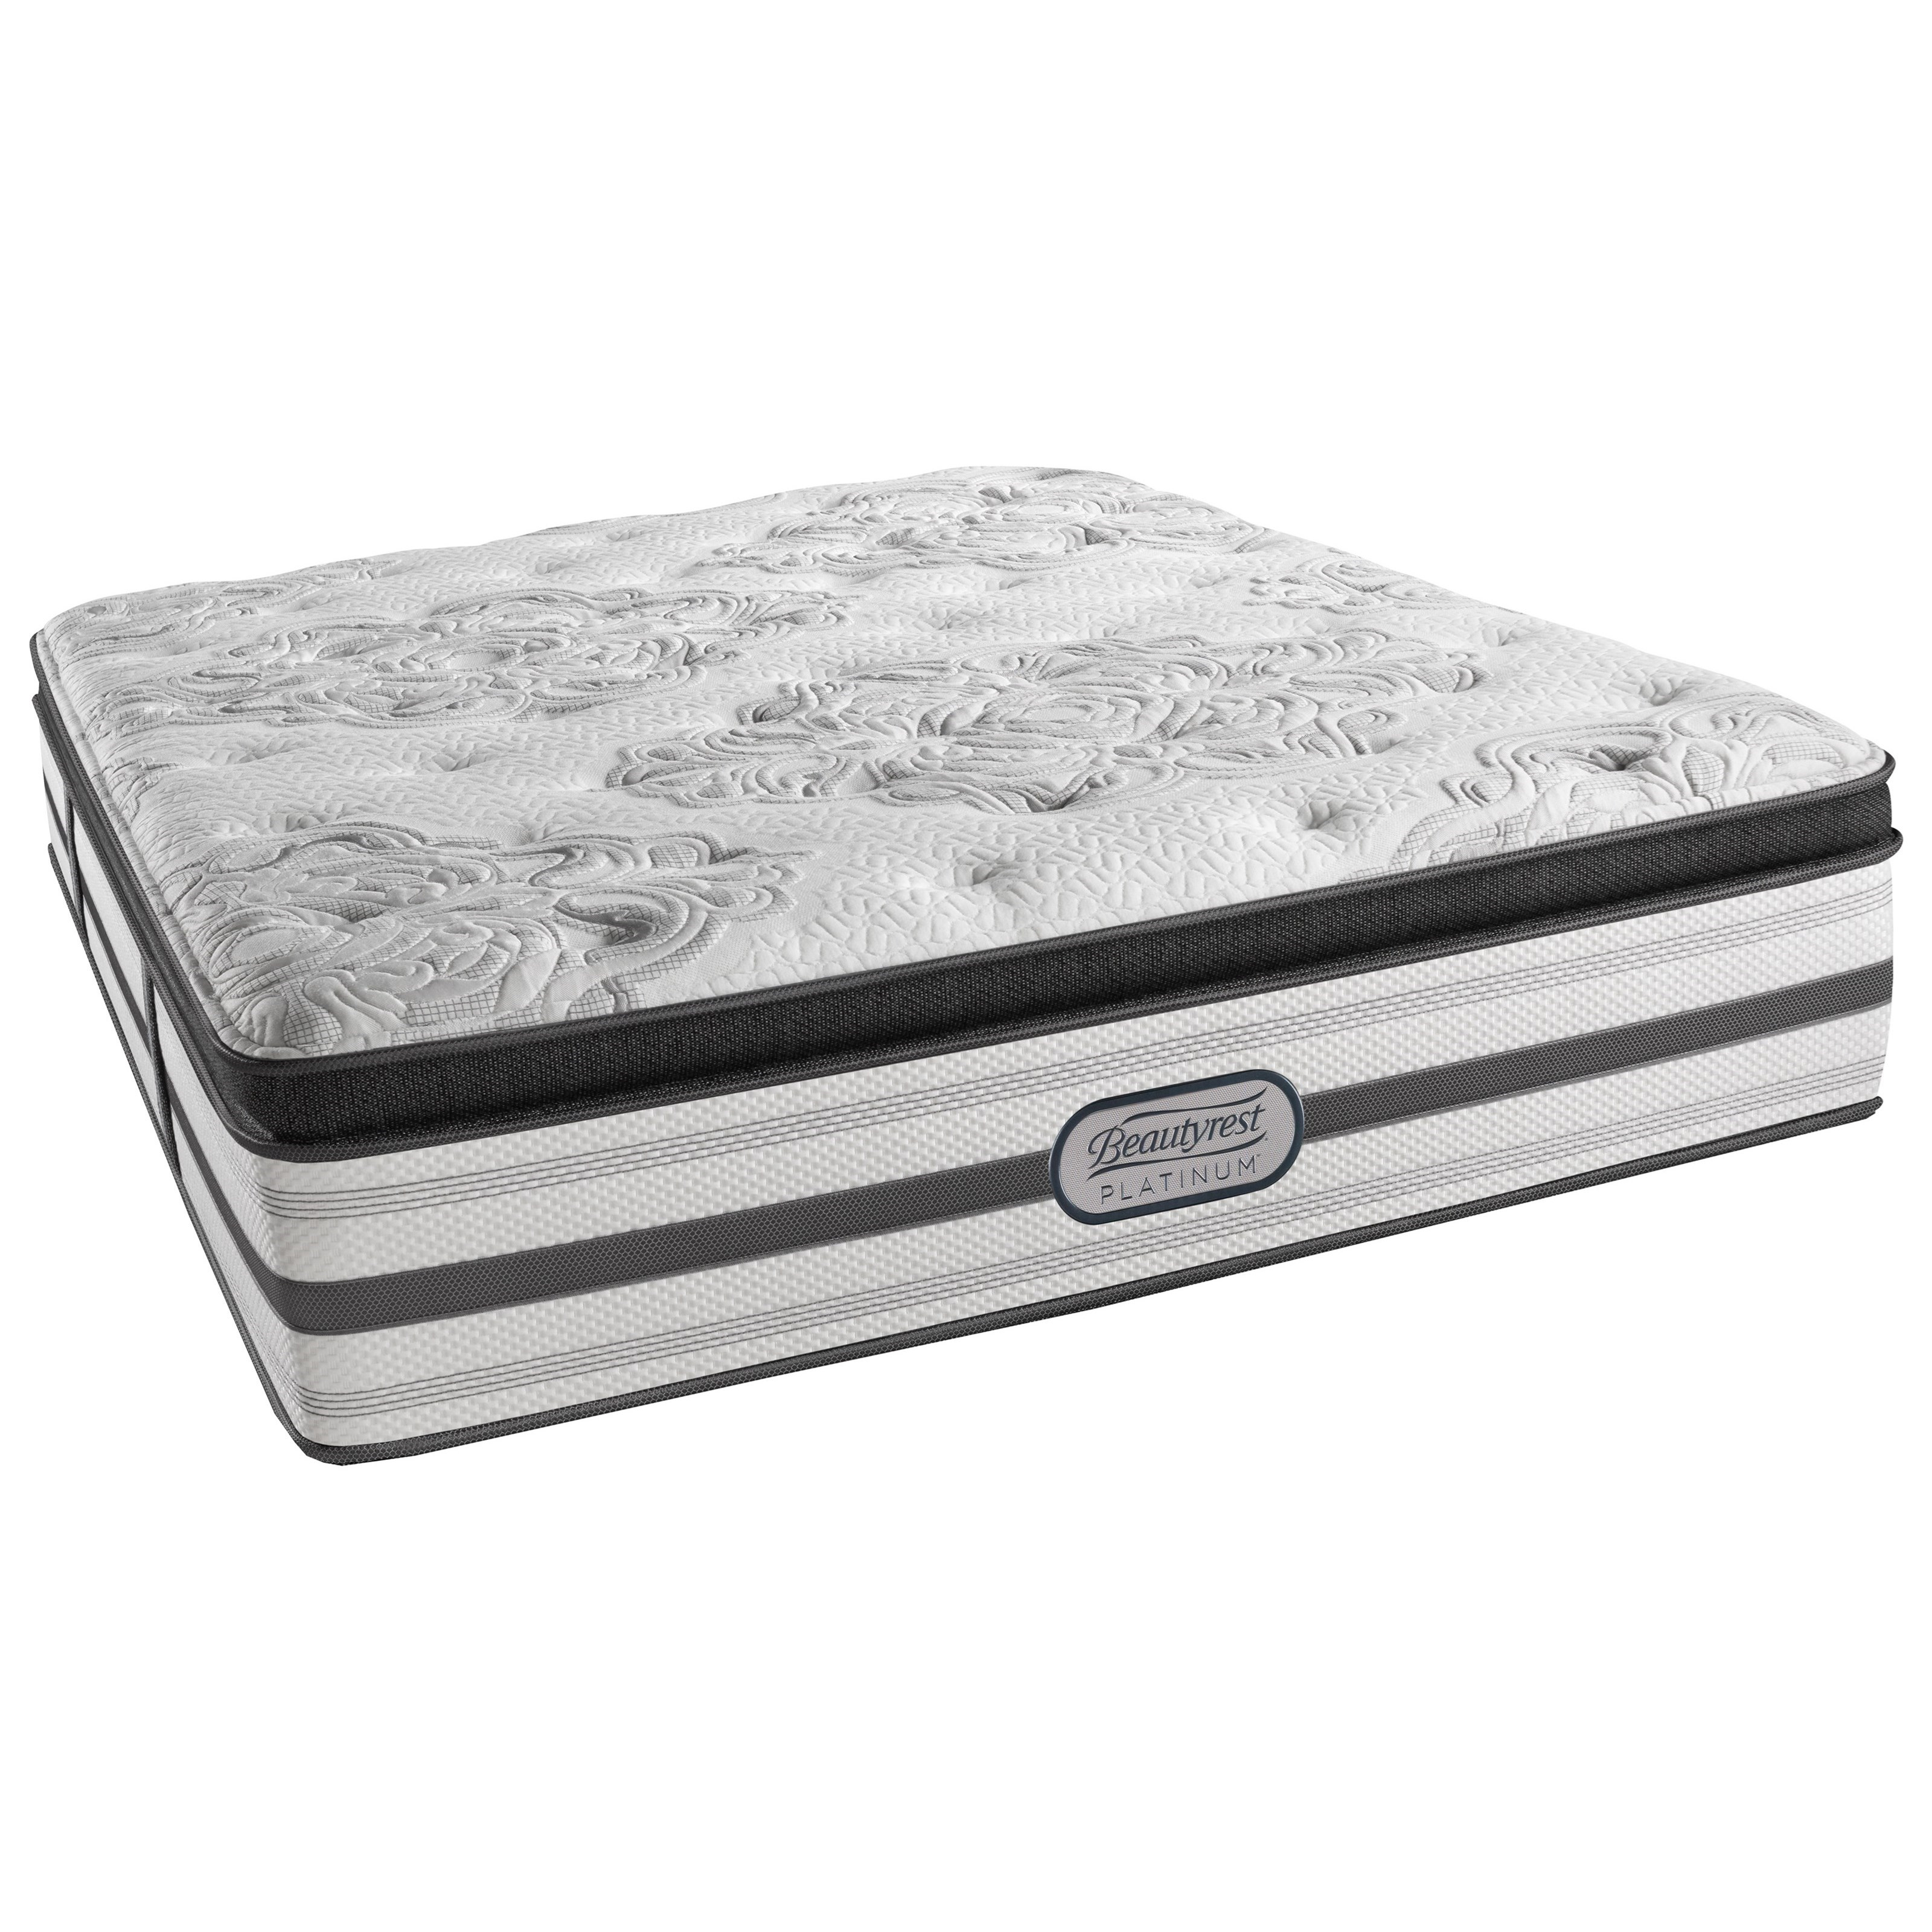 Beautyrest Platinum Gabriella CK Luxury Firm Pillow Top Adjustable Set - Item Number: LV3LFPT-CK+2xSM3-SPCK